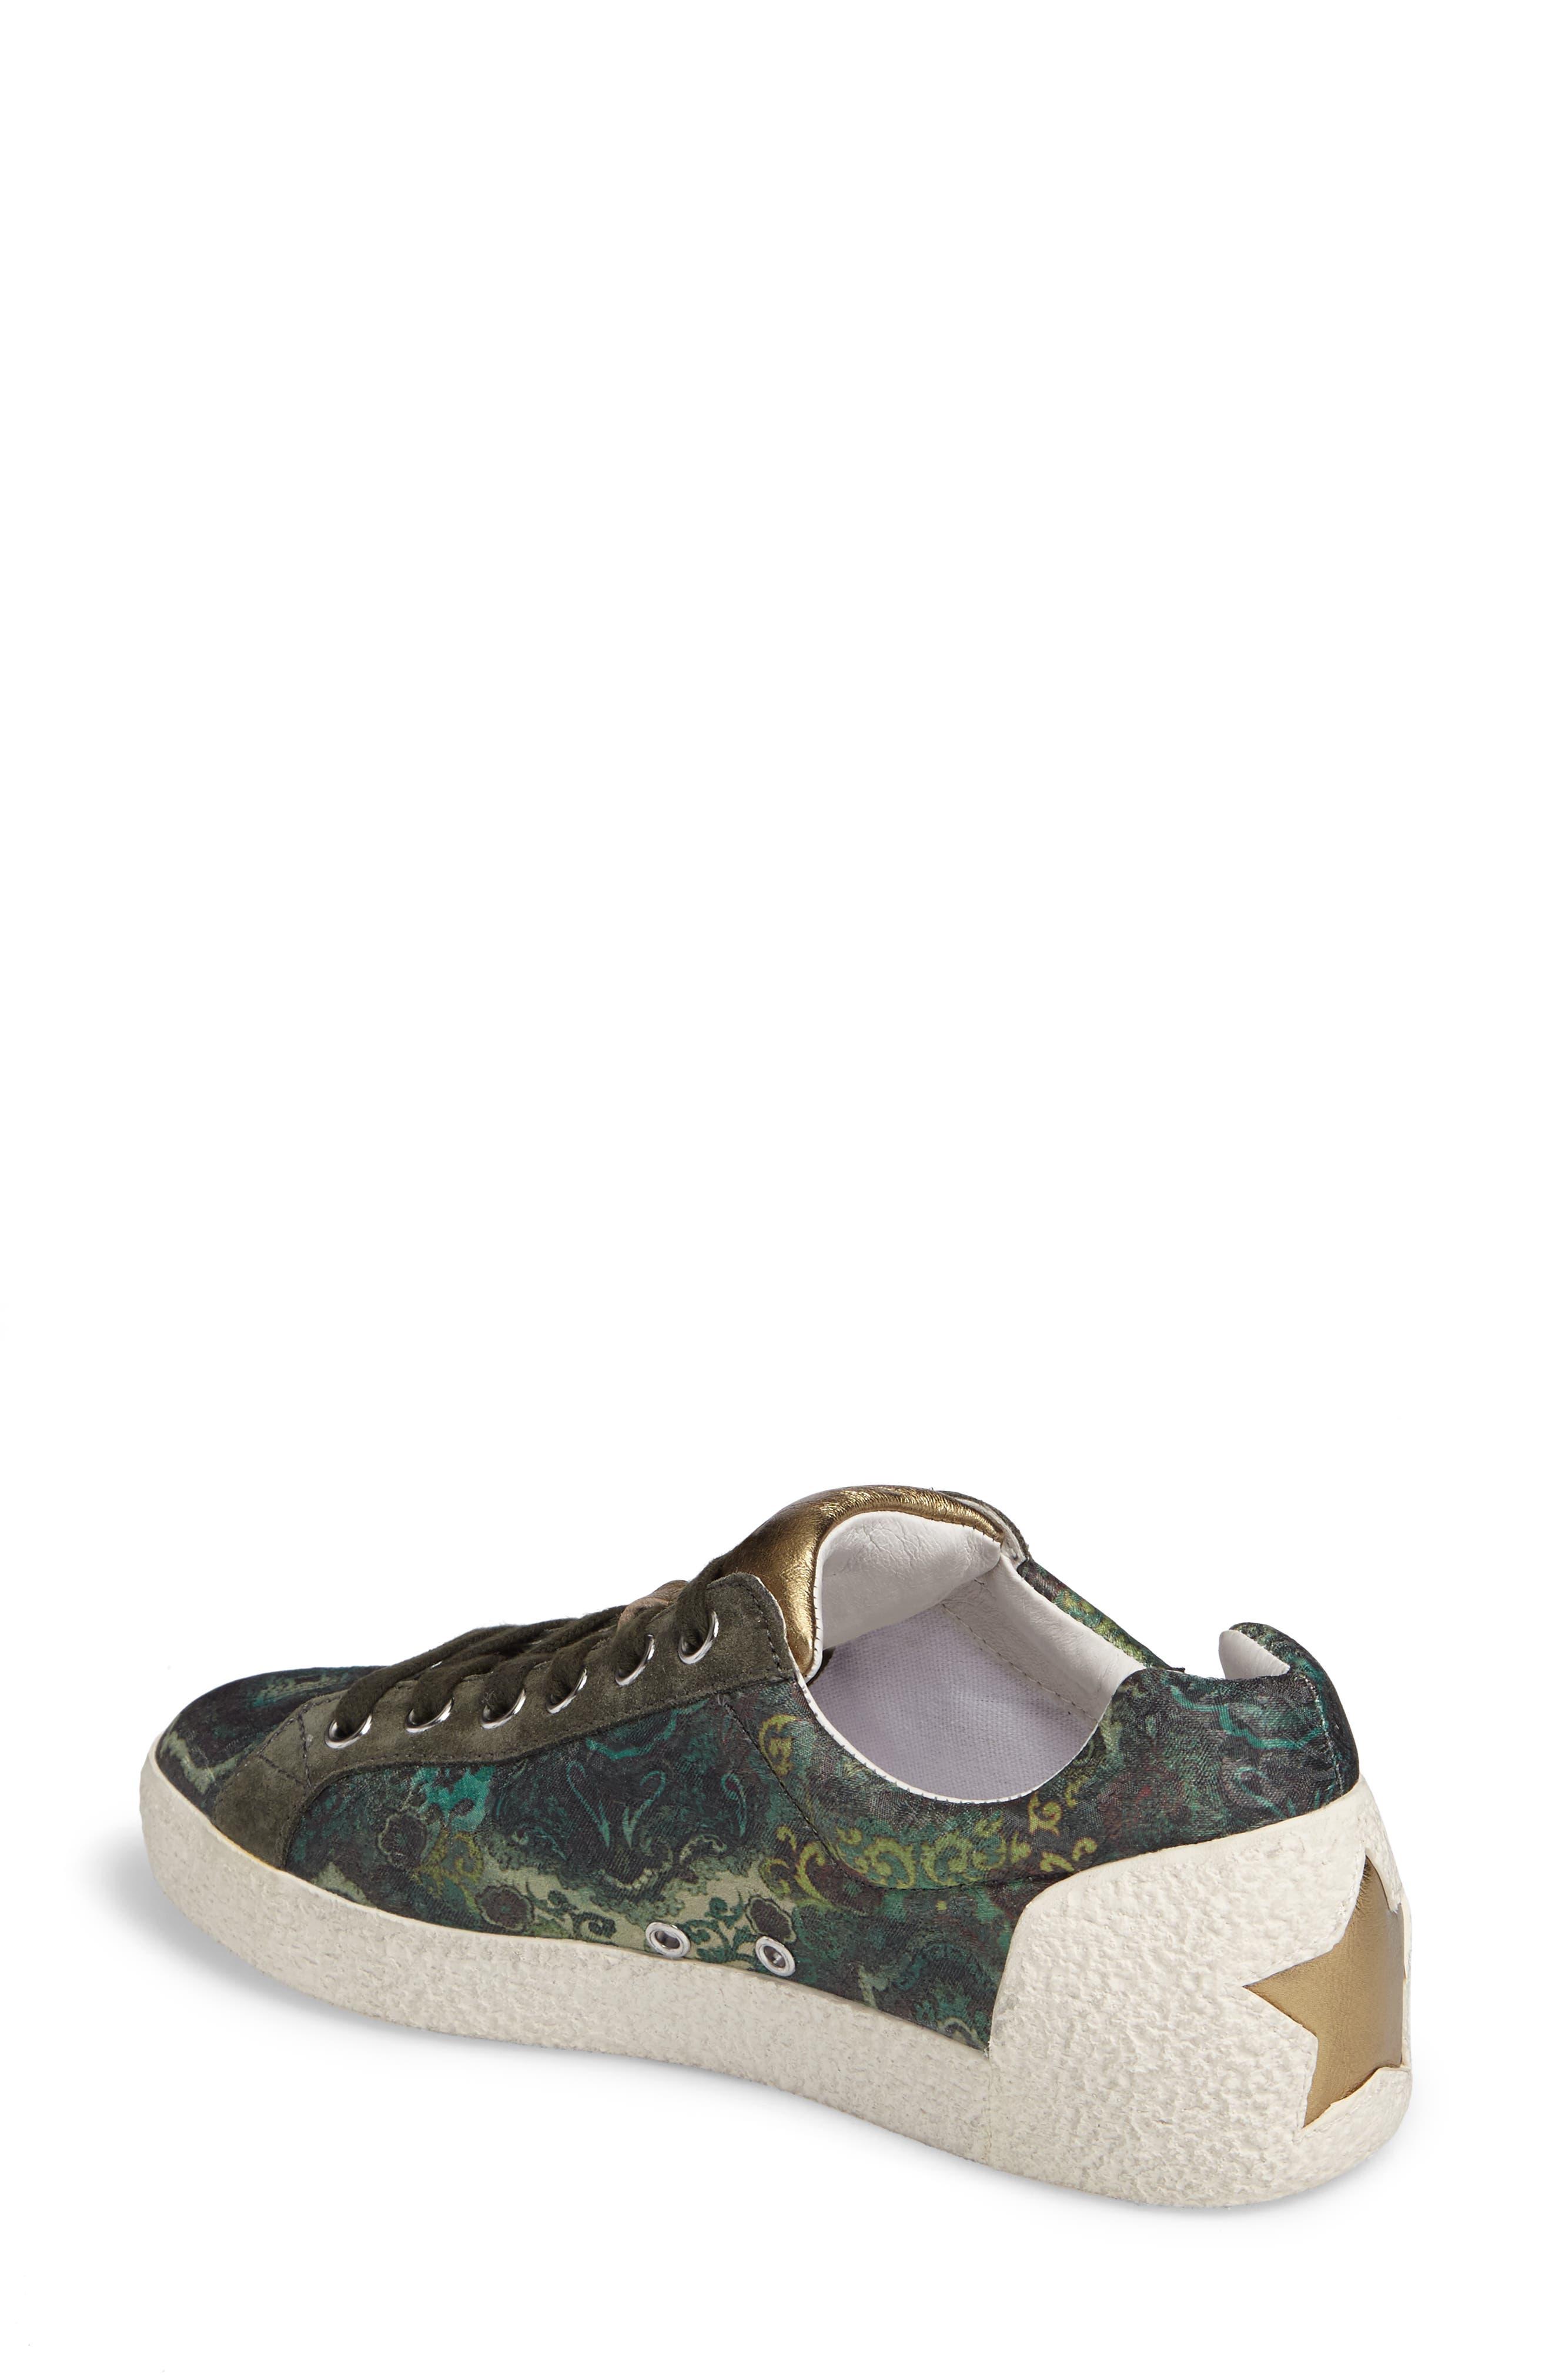 Embellished Low-Top Sneaker,                             Alternate thumbnail 2, color,                             312